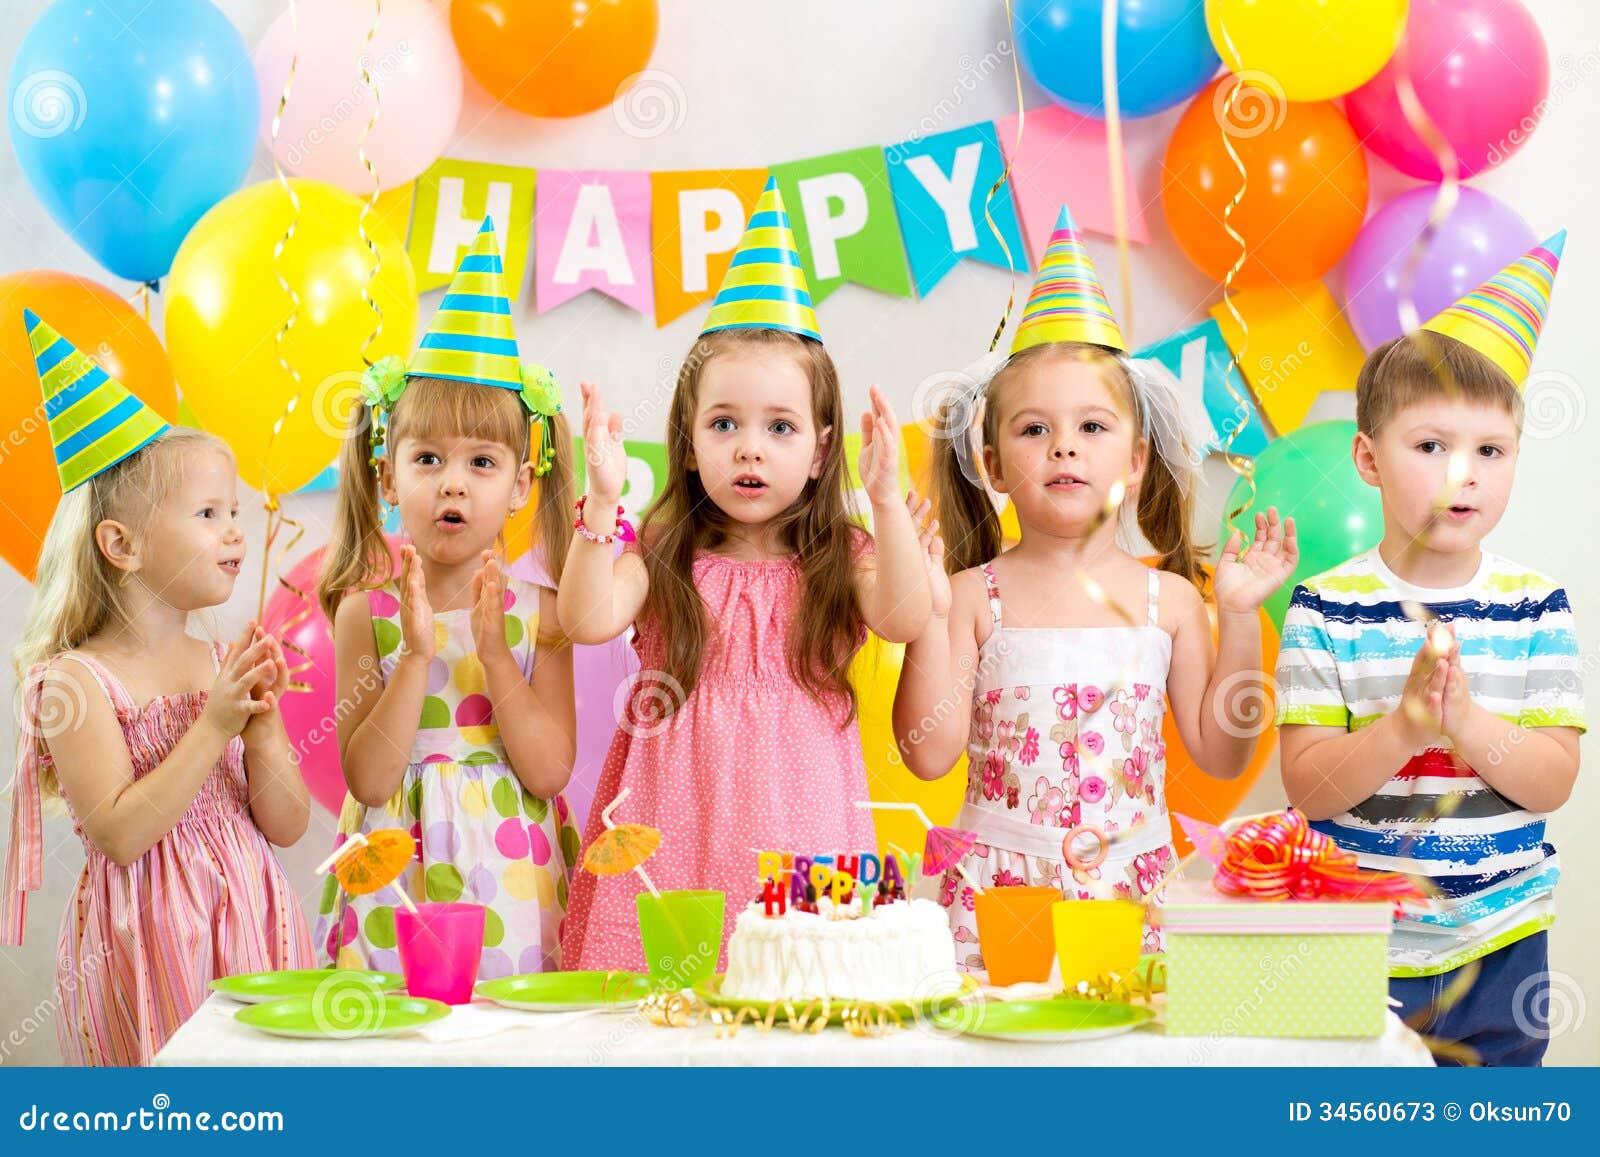 essay on birthday party celebration for kids